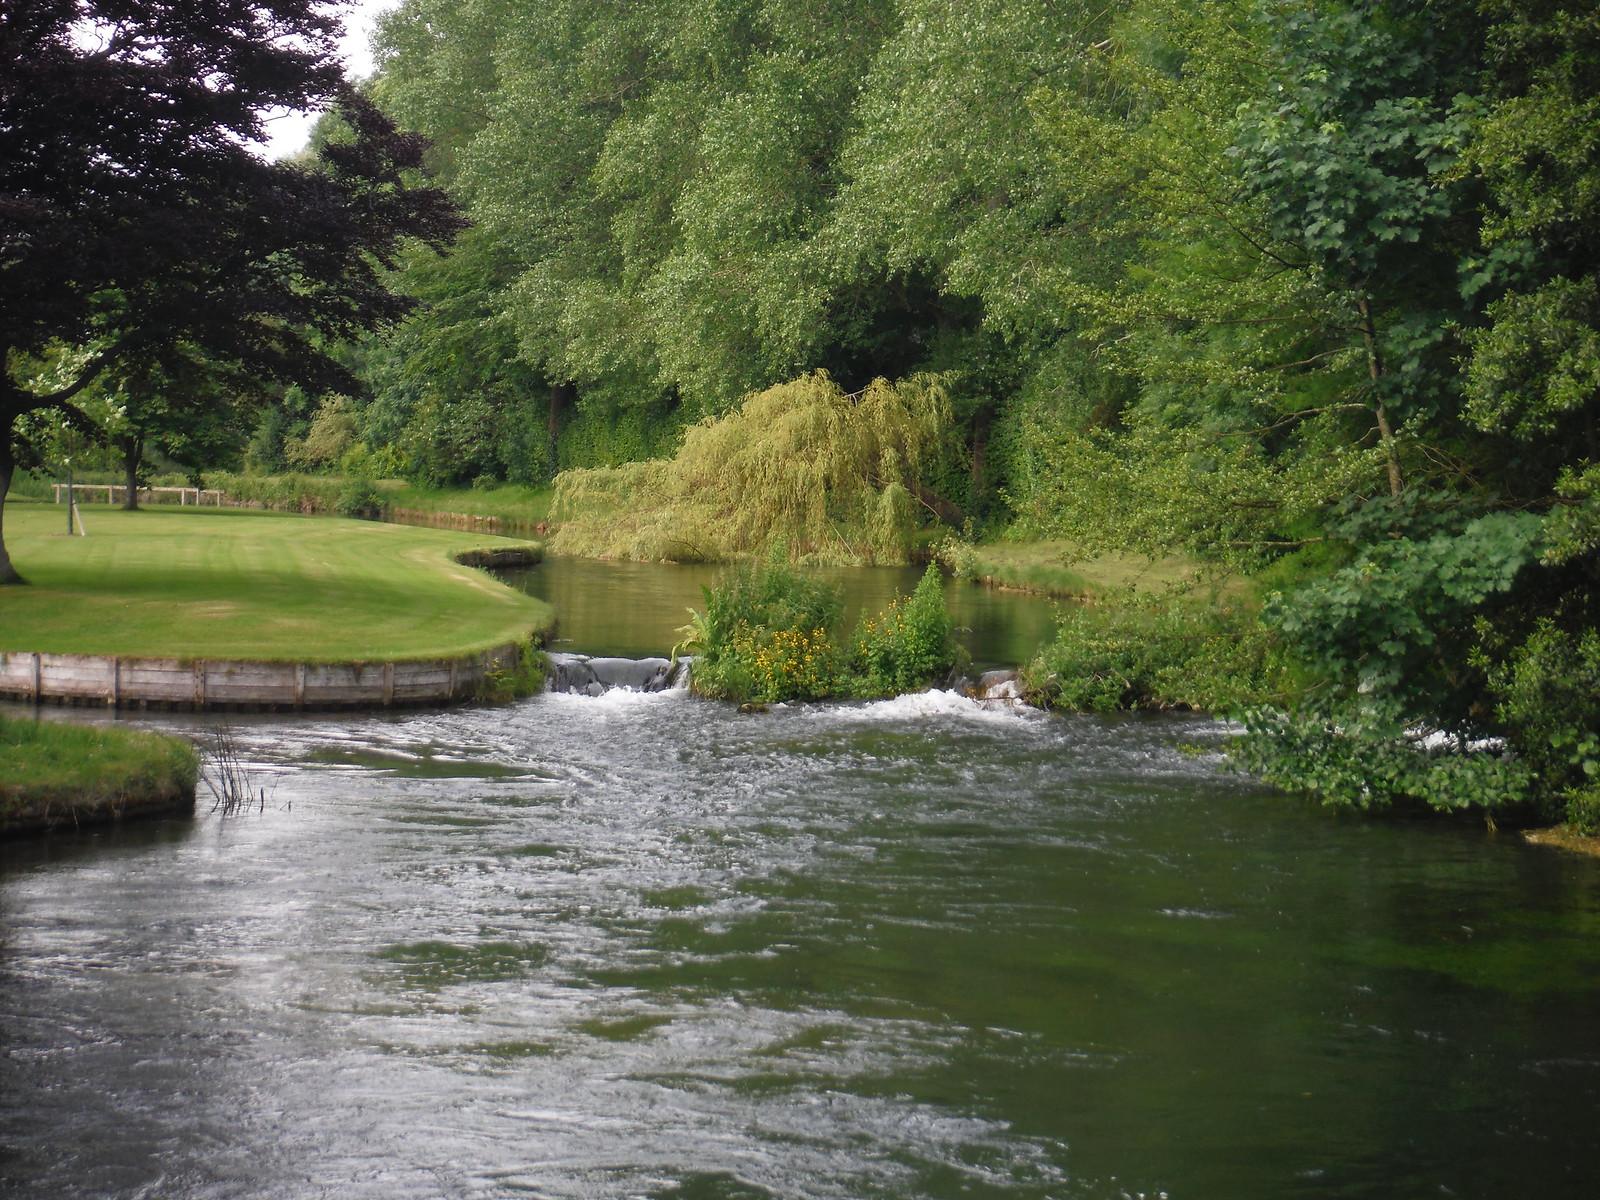 Park Stream arm of Test River, Lower Brook SWC Walk 265 - Dean to Mottisfont and Dunbridge